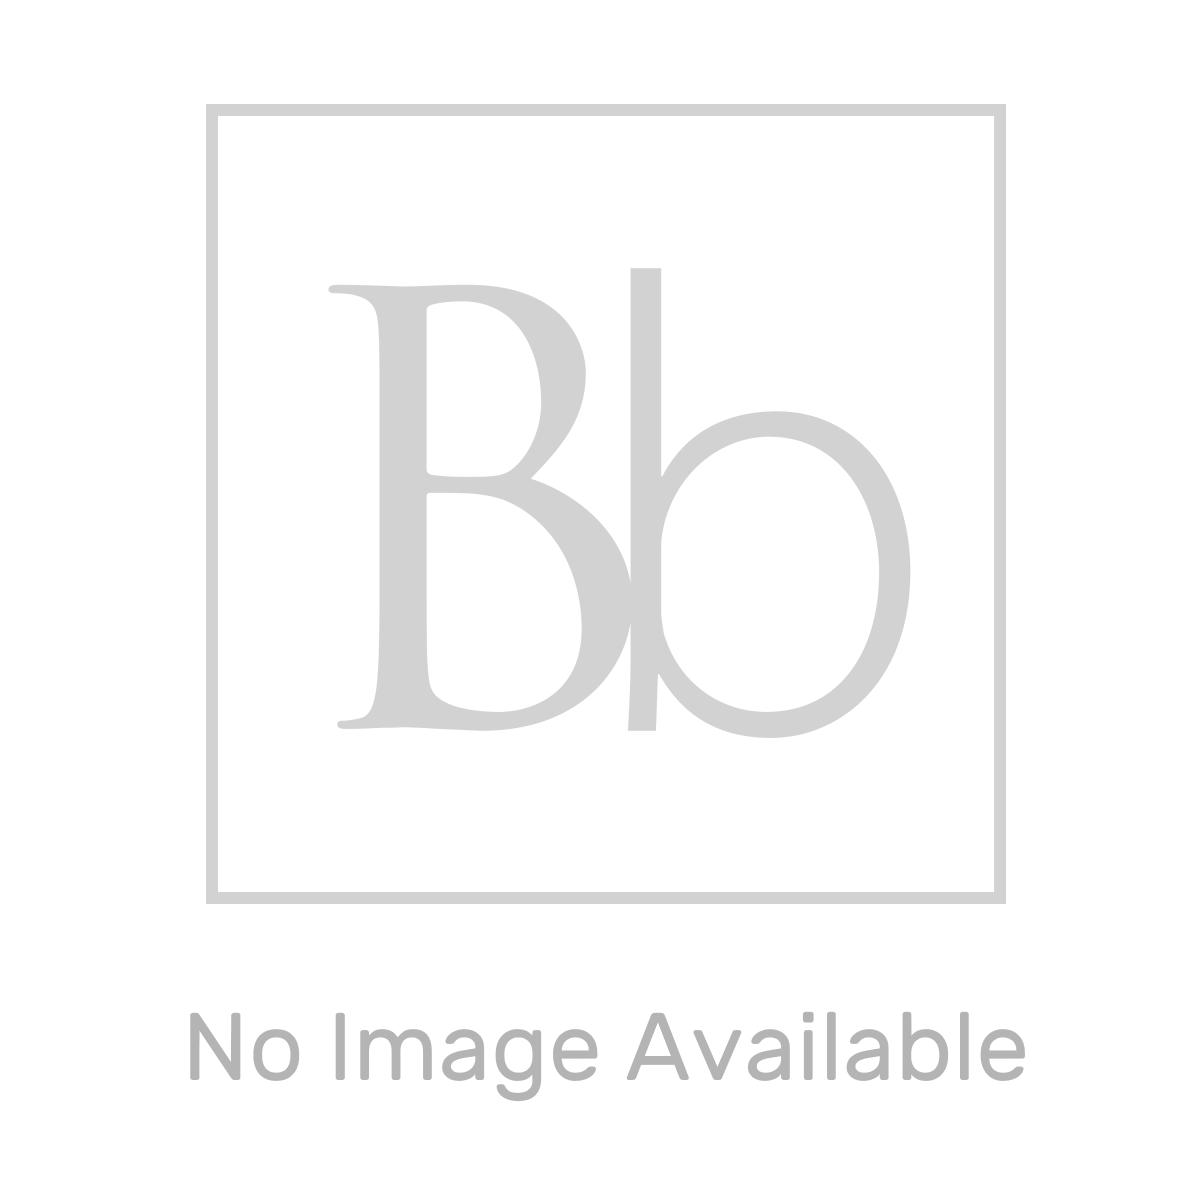 Premier Anthracite Square Ladder Towel Rail